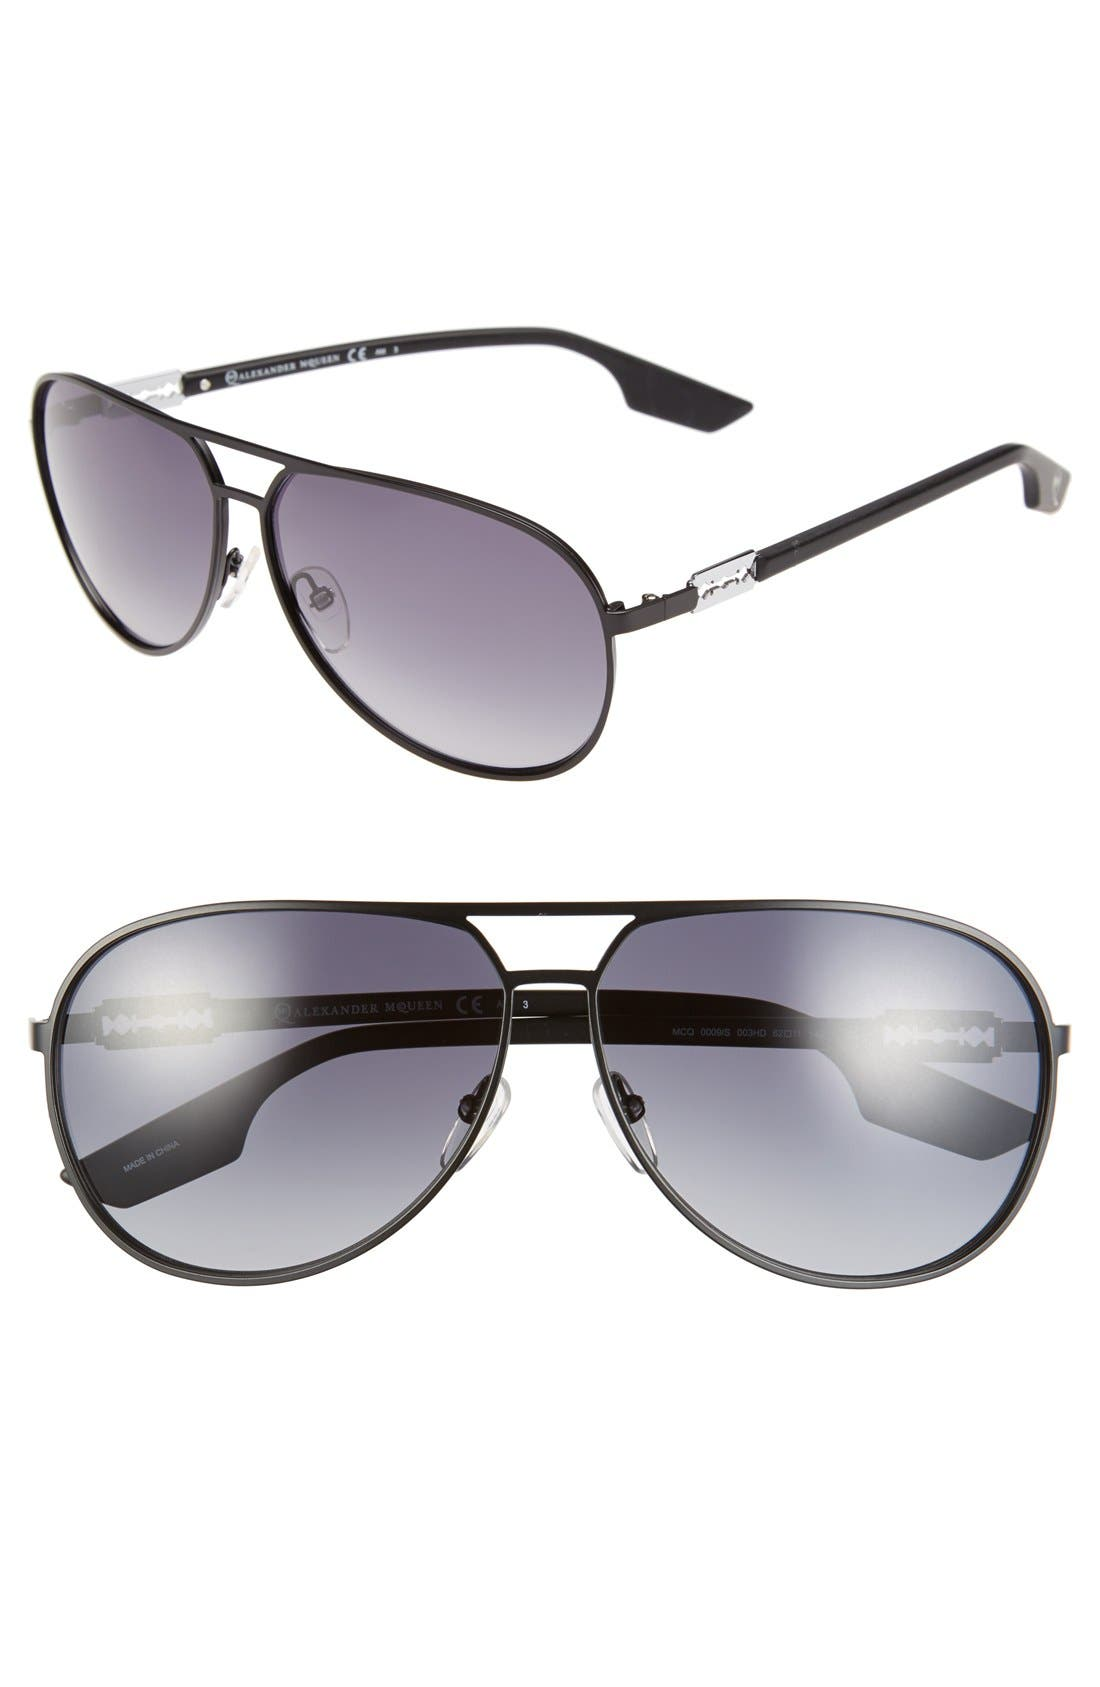 MCQ ALEXANDER MCQUEEN,                             McQ by Alexander McQueen 62mm Stainless Steel Aviator Sunglasses,                             Main thumbnail 1, color,                             001